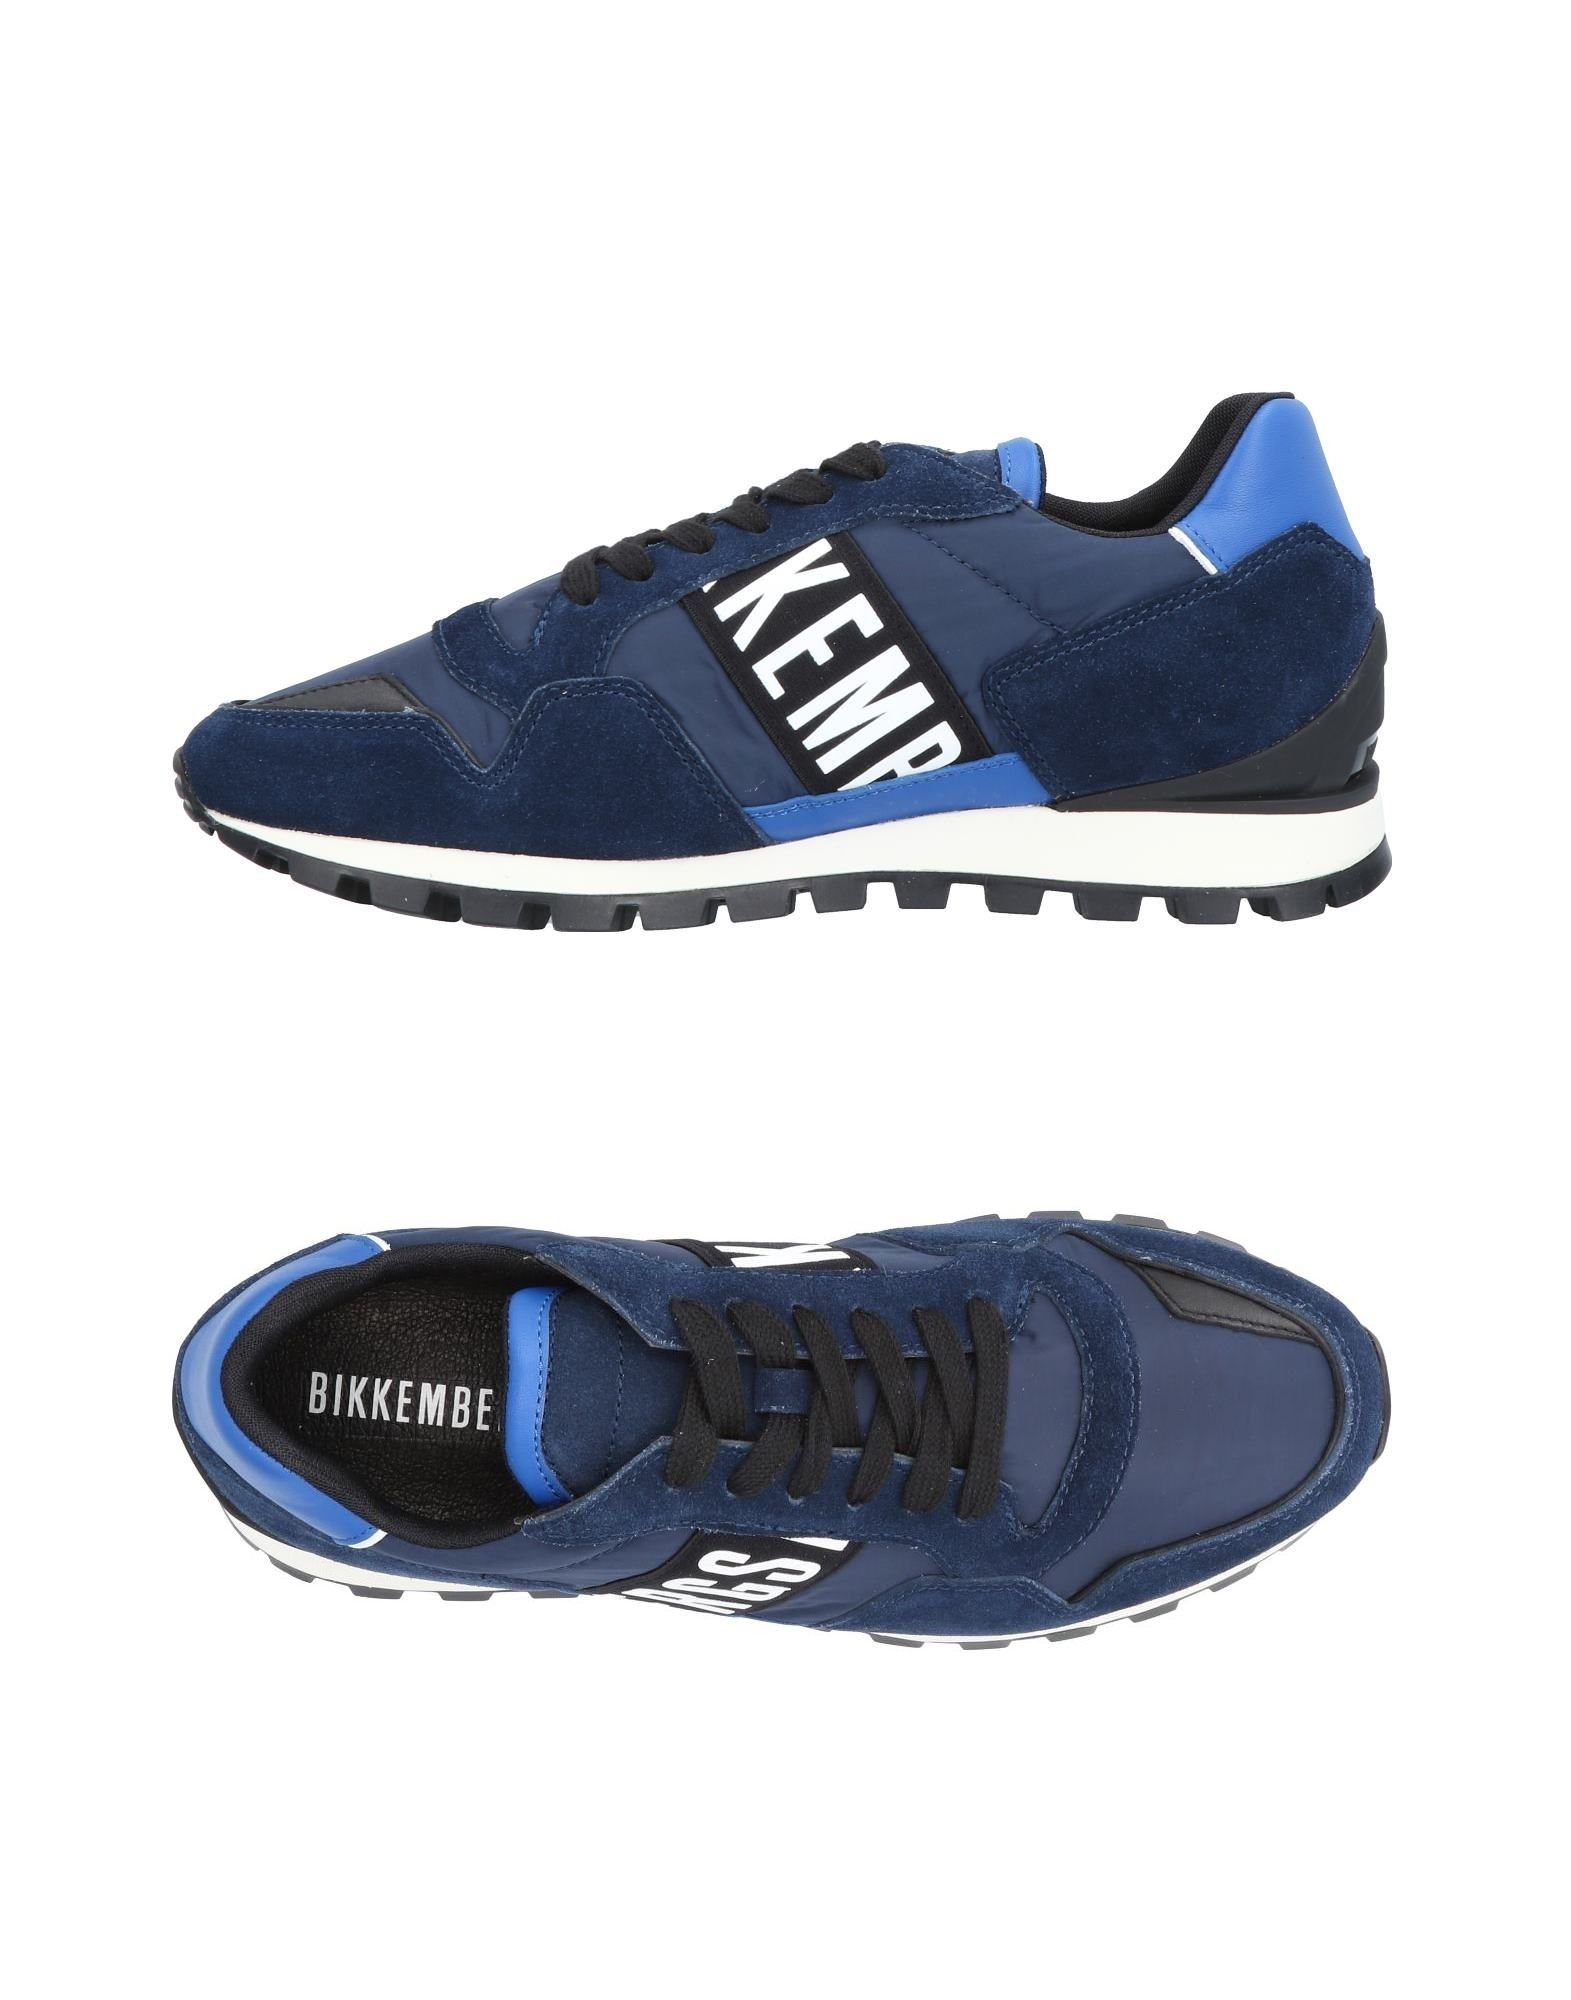 Moda Sneakers Bikkembergs Uomo - - - 11449910JD c4446d